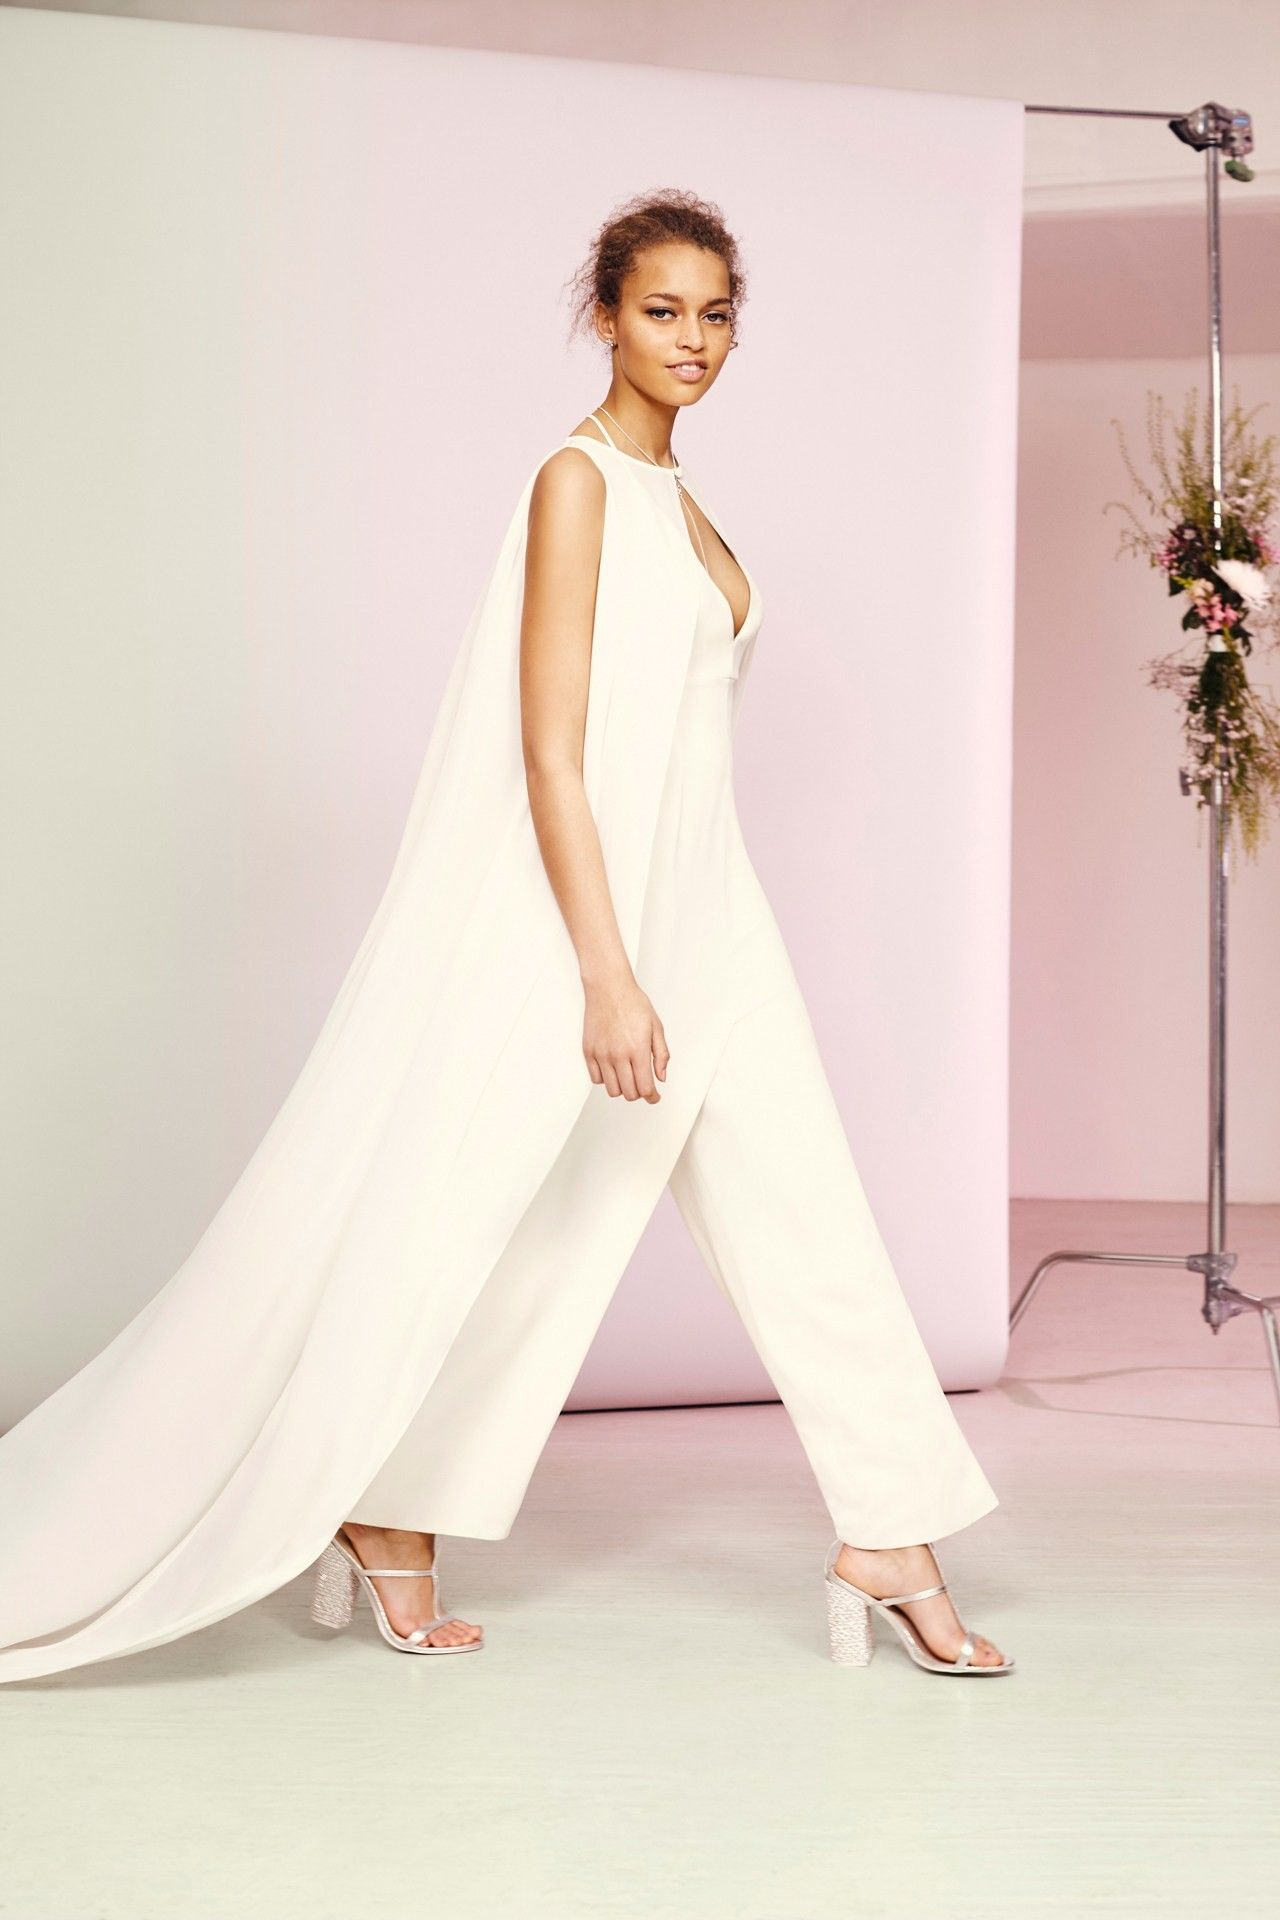 Affordable wedding dresses near me  ASOSus New Wedding Dresses Look So Expensive  Wedding dress